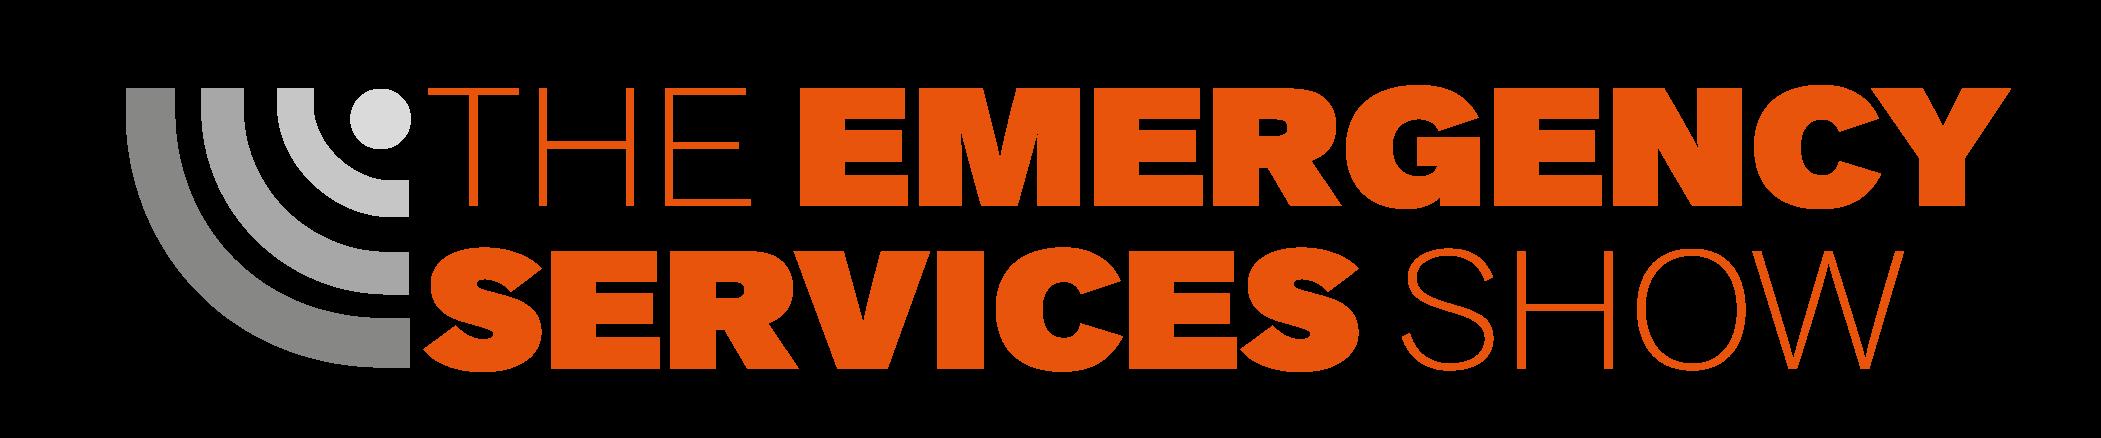 Rapid Response Medical Services Ltd